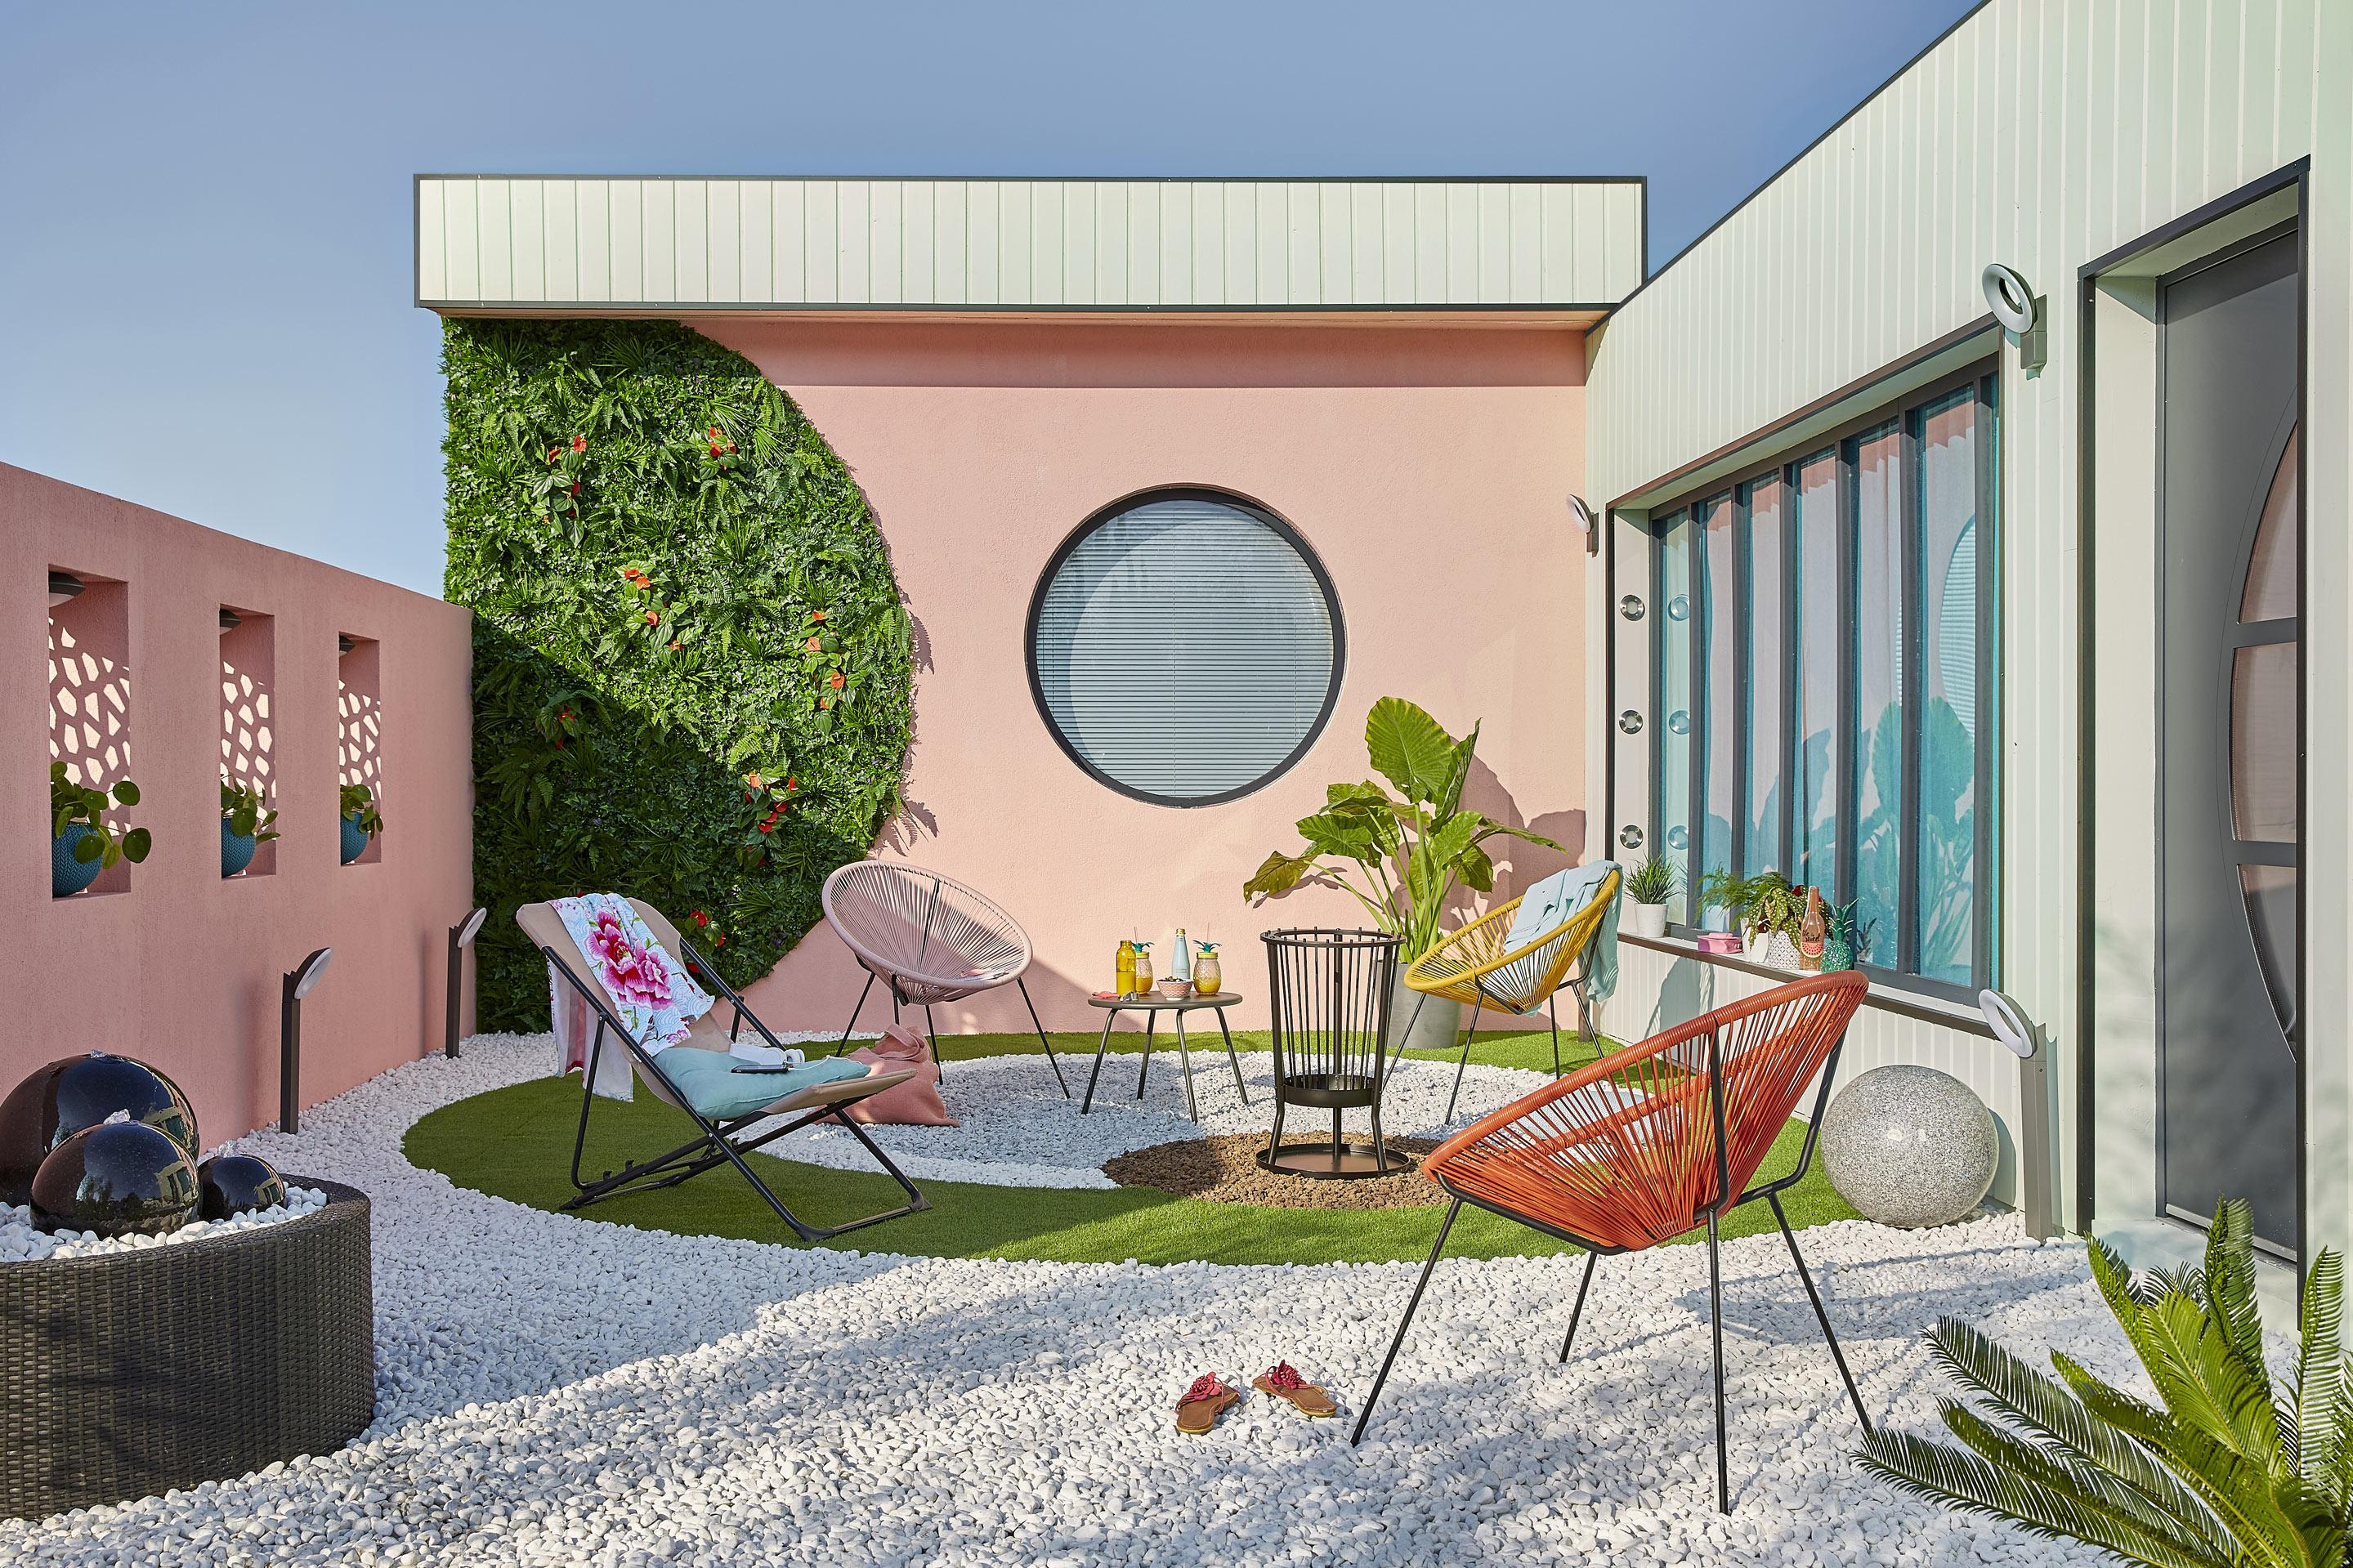 Fauteuil de jardin en polyéthylène acapulco terracotta leroy merlin